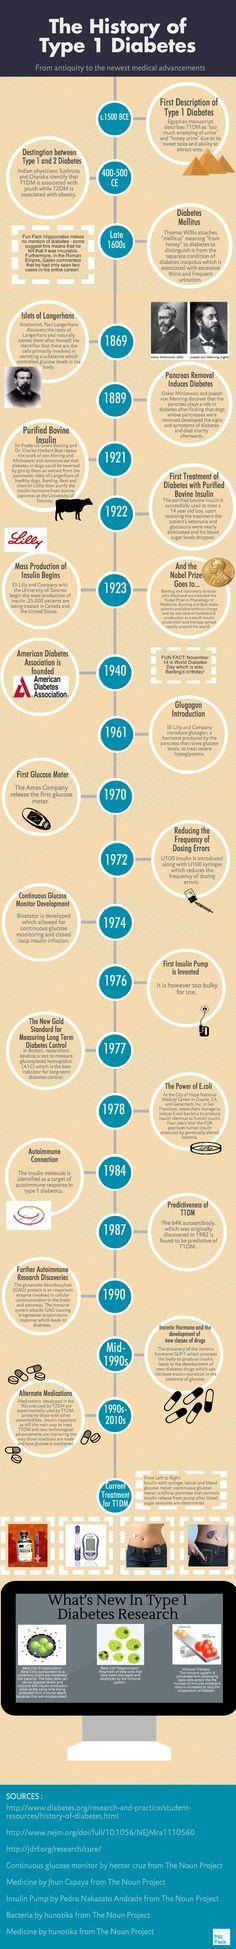 History of Type 1 Diabetes   Piktochart Infographic Editor